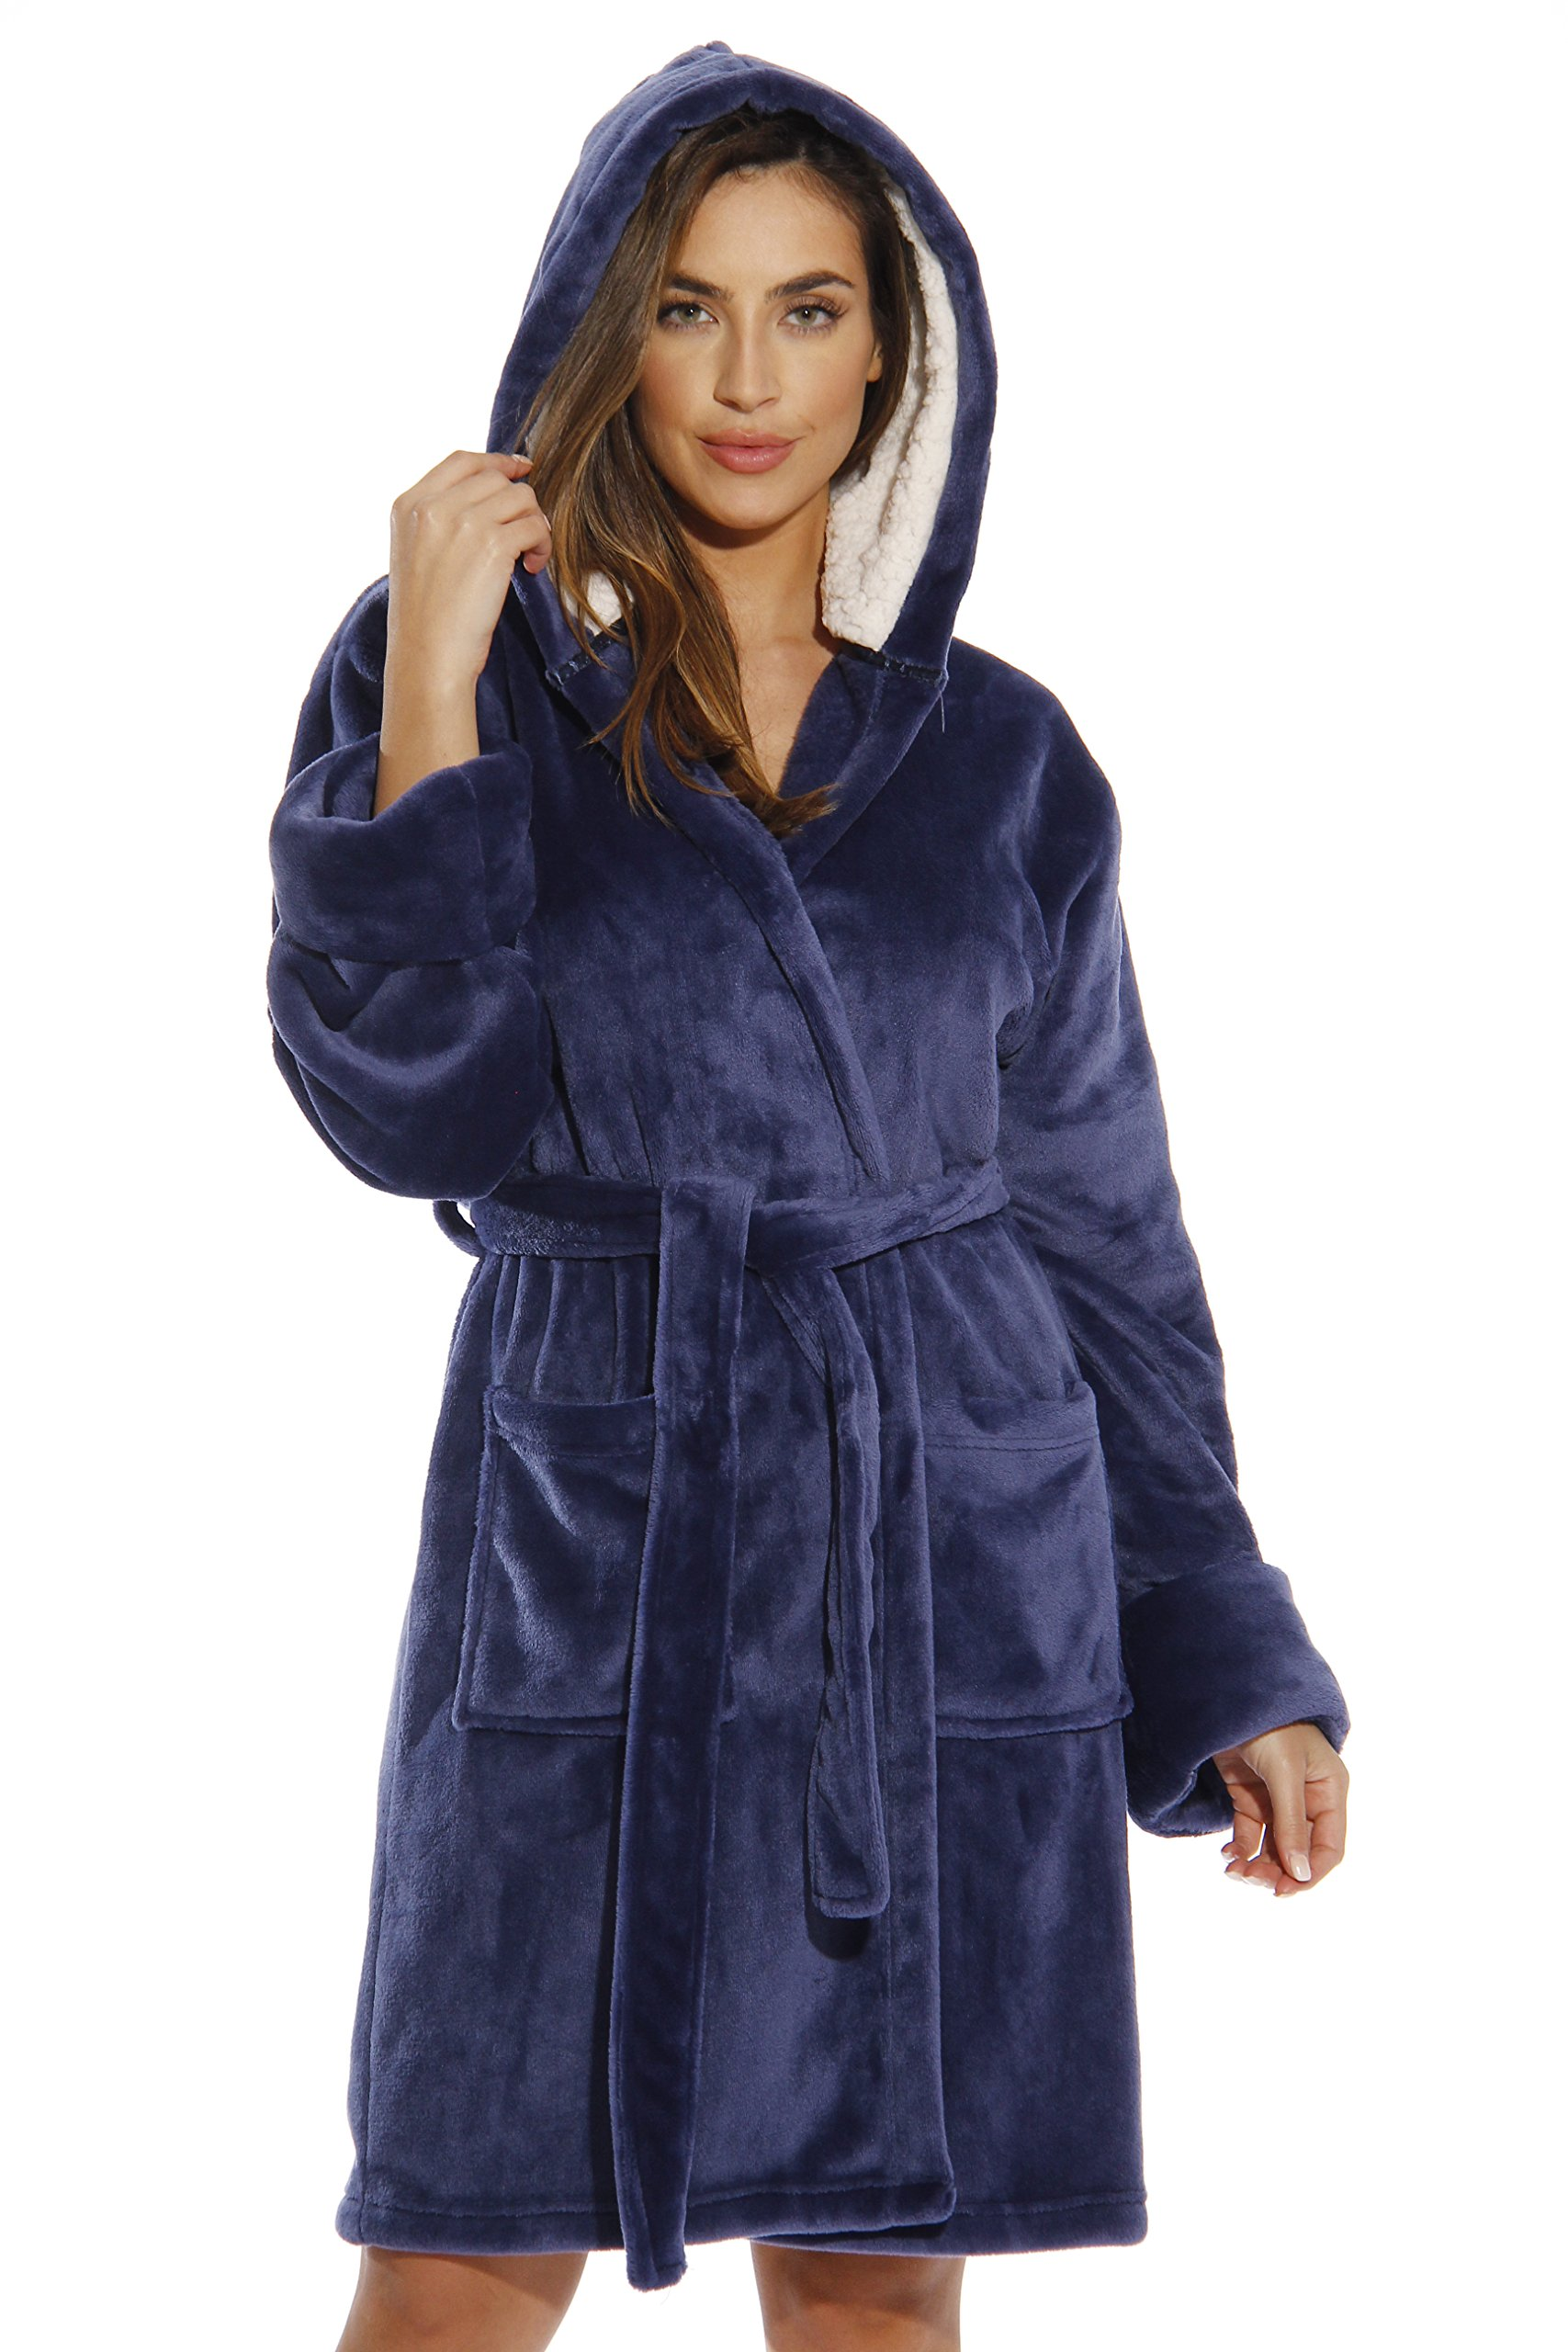 6364-NVY-L Just Love Kimono Robe / Bath Robes for Women